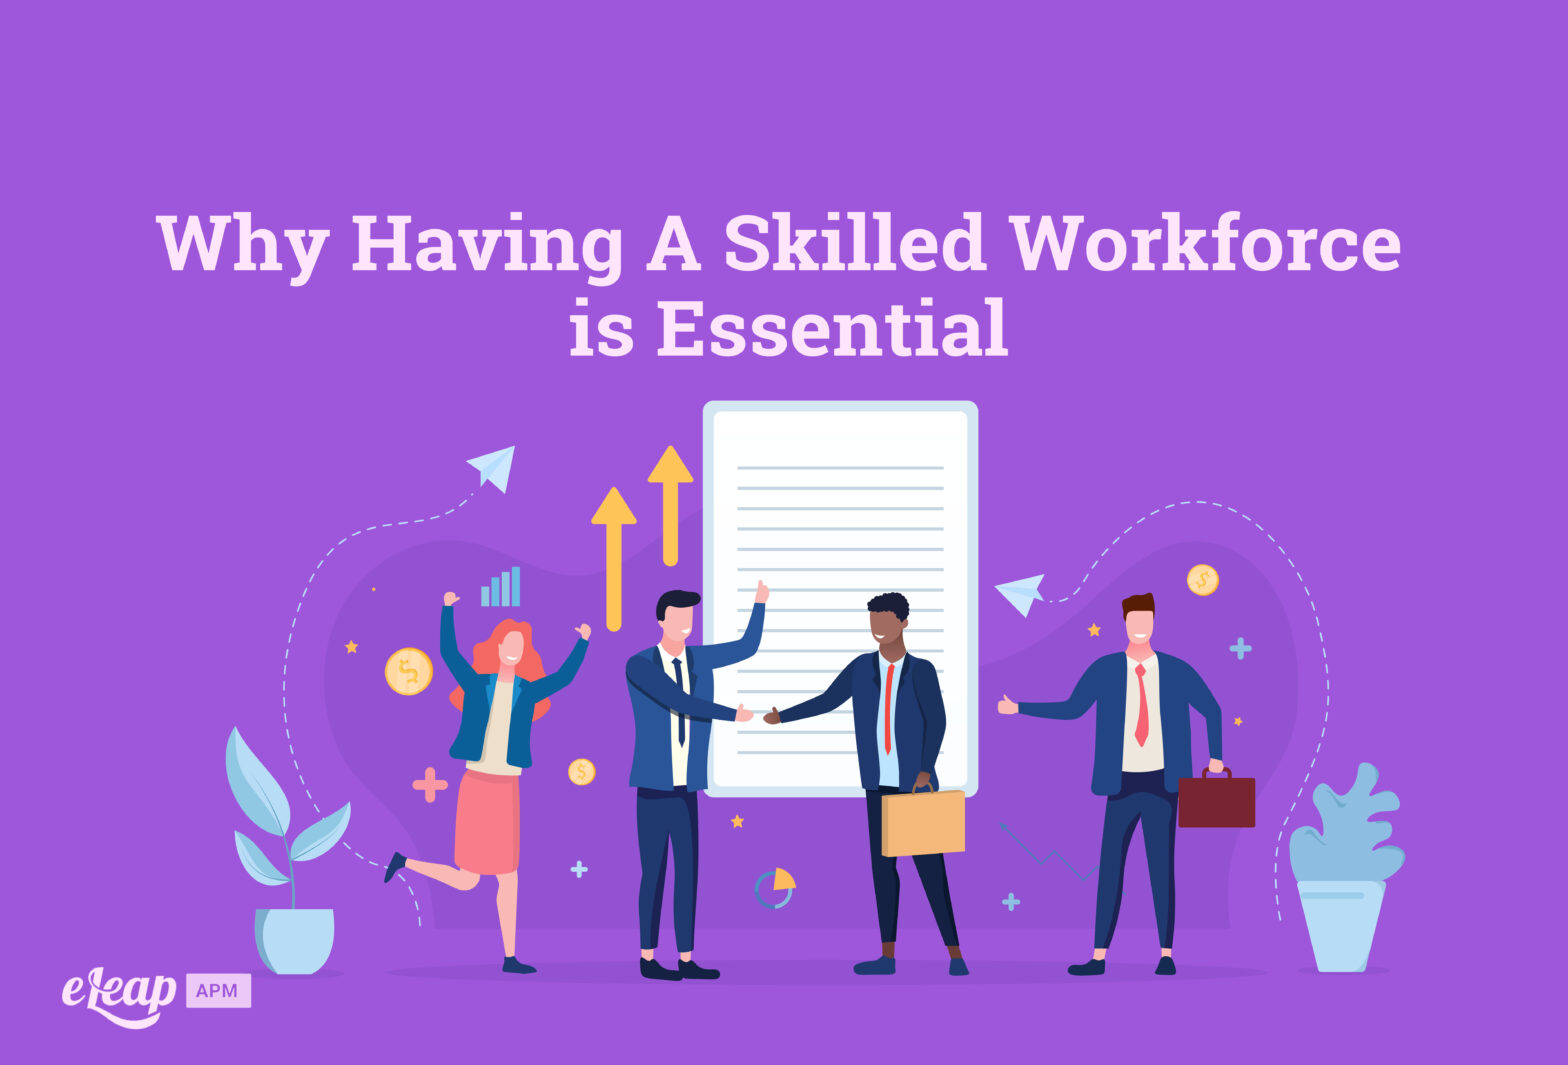 Why Having A Skilled Workforce is Essential